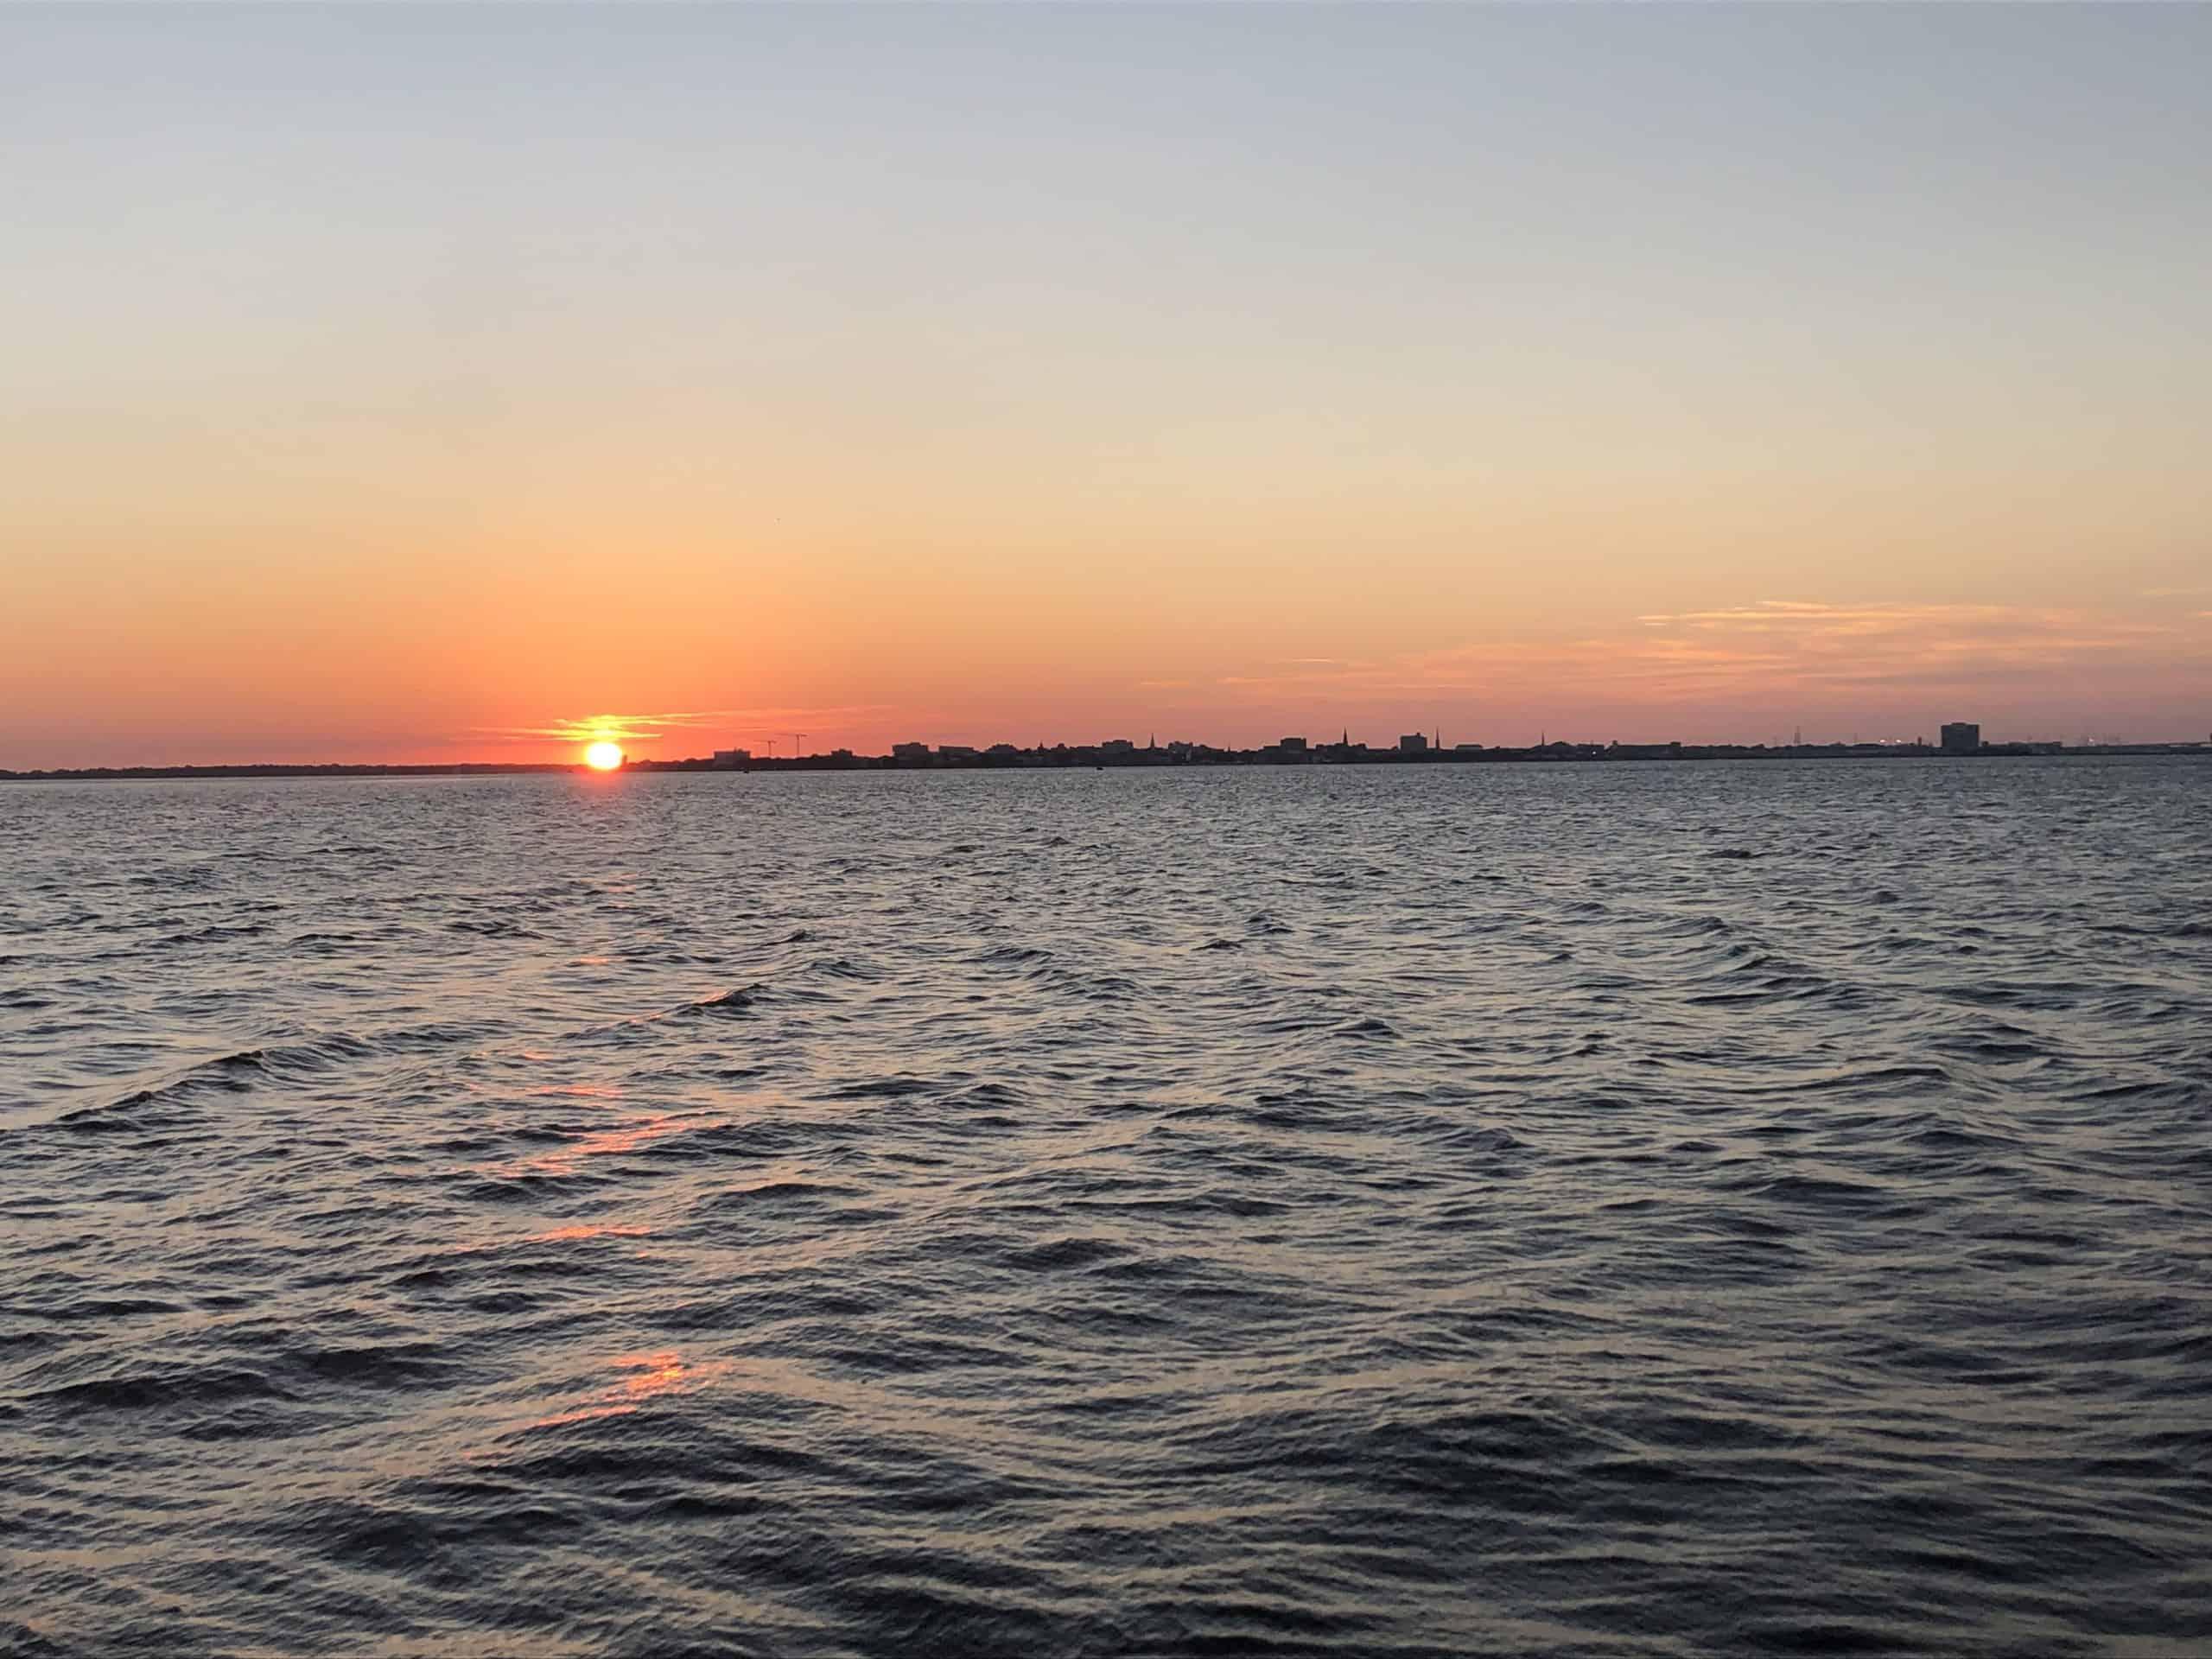 Sun setting on water. Sunset cocktail cruise Charleston, SC